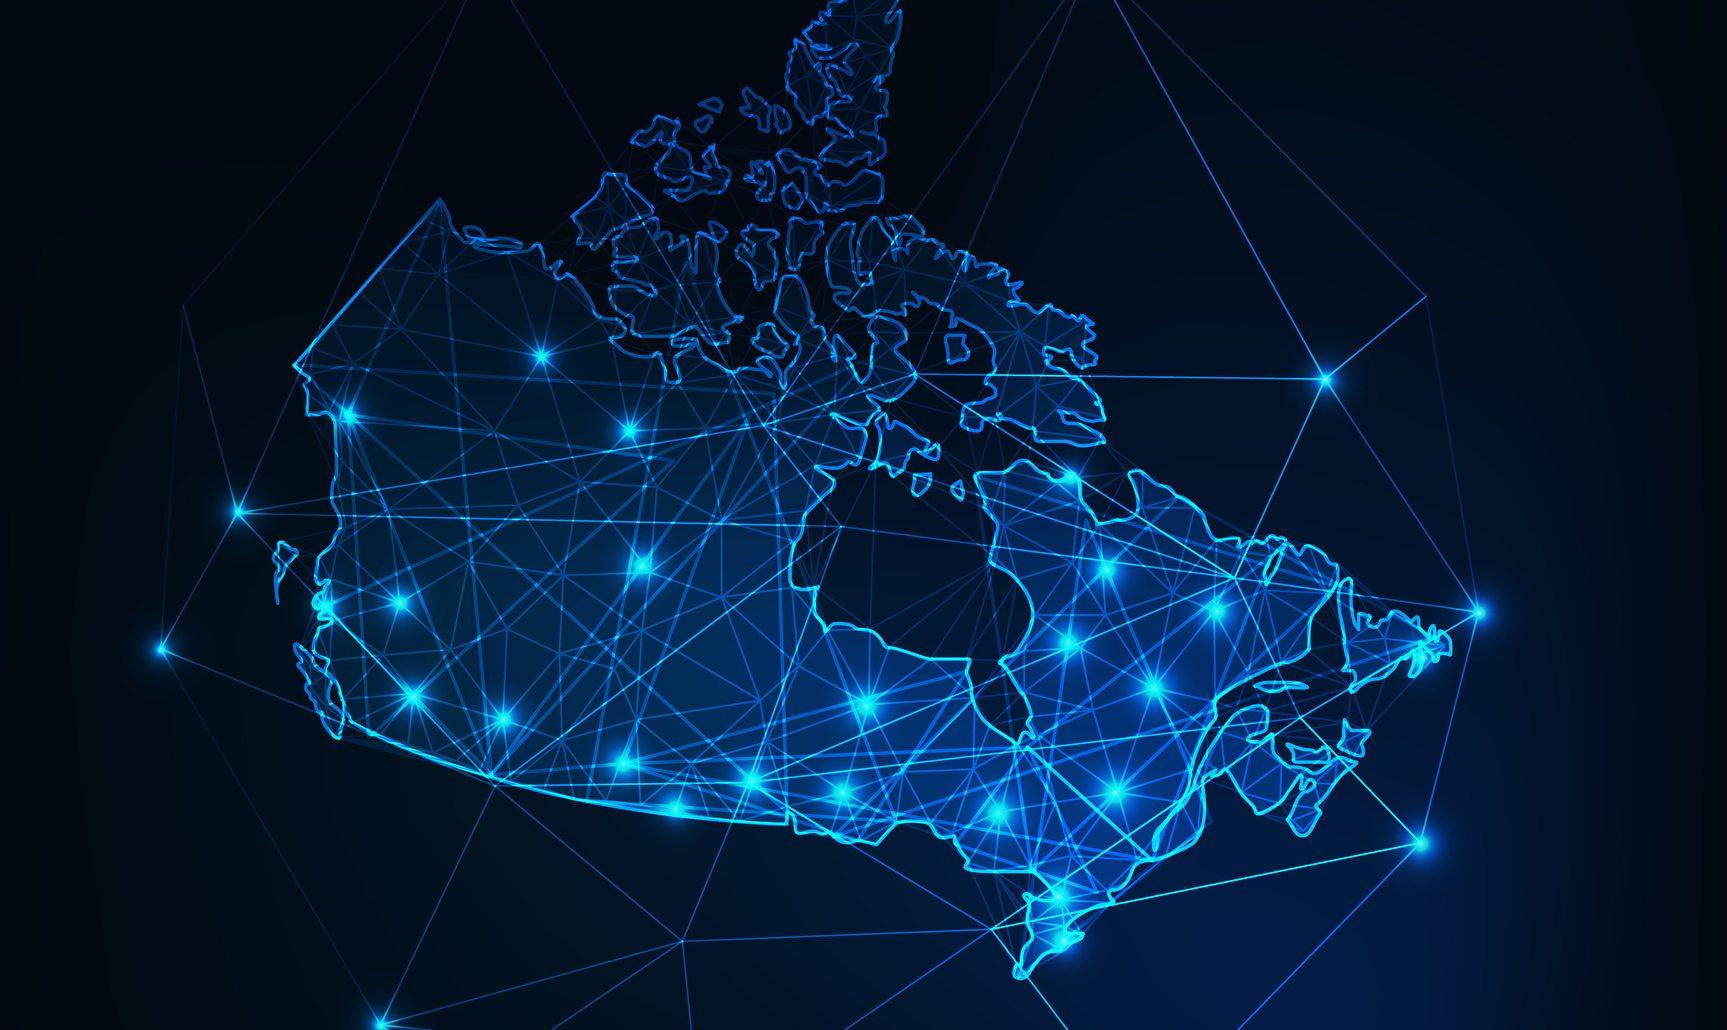 Cyber Canada map